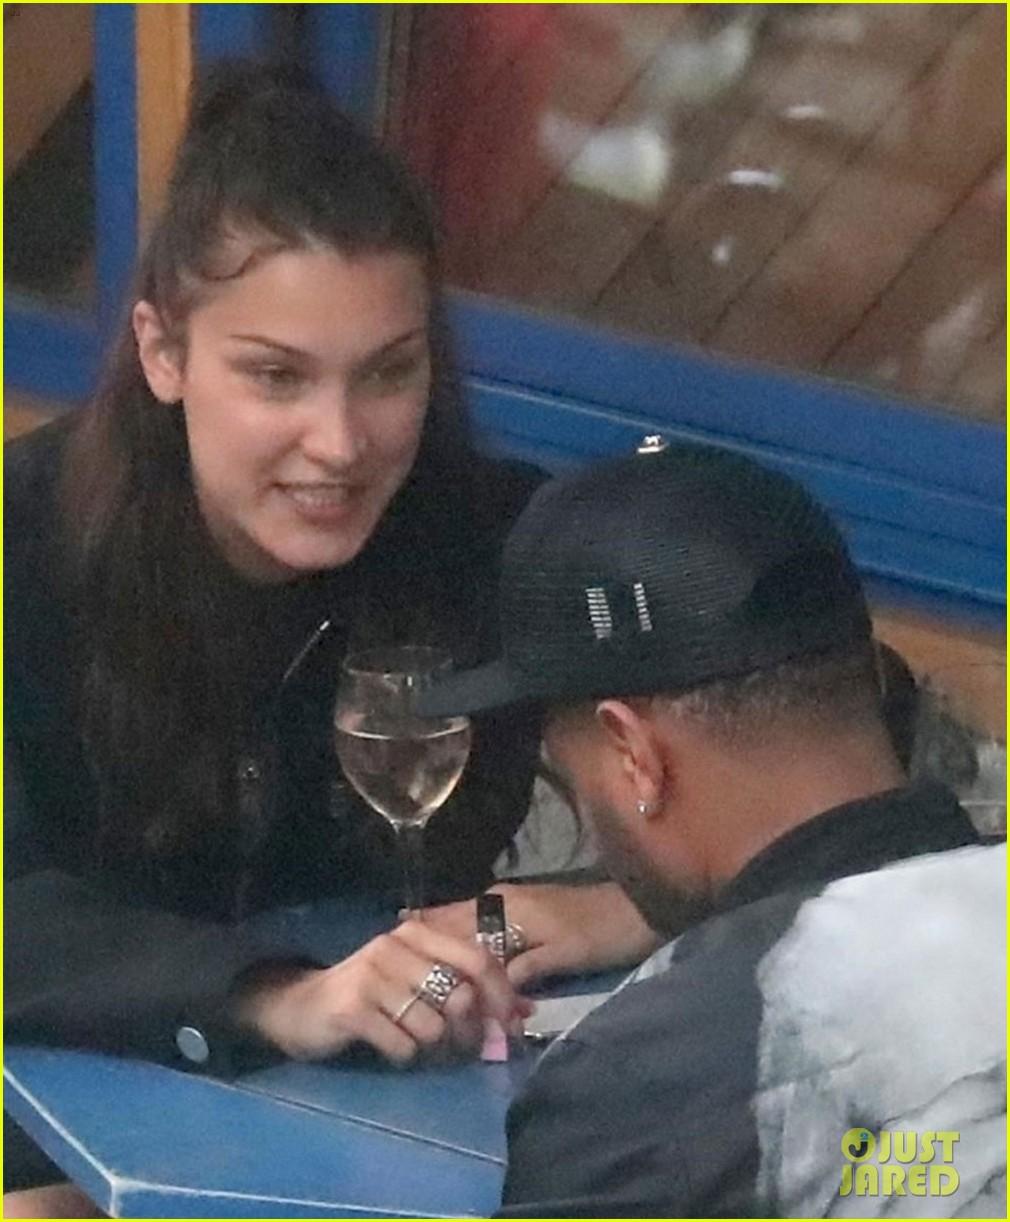 Bella Hadid kembali kepergok bermesraan bareng The Weeknd, beneran balikan? (dok. Just Jared)